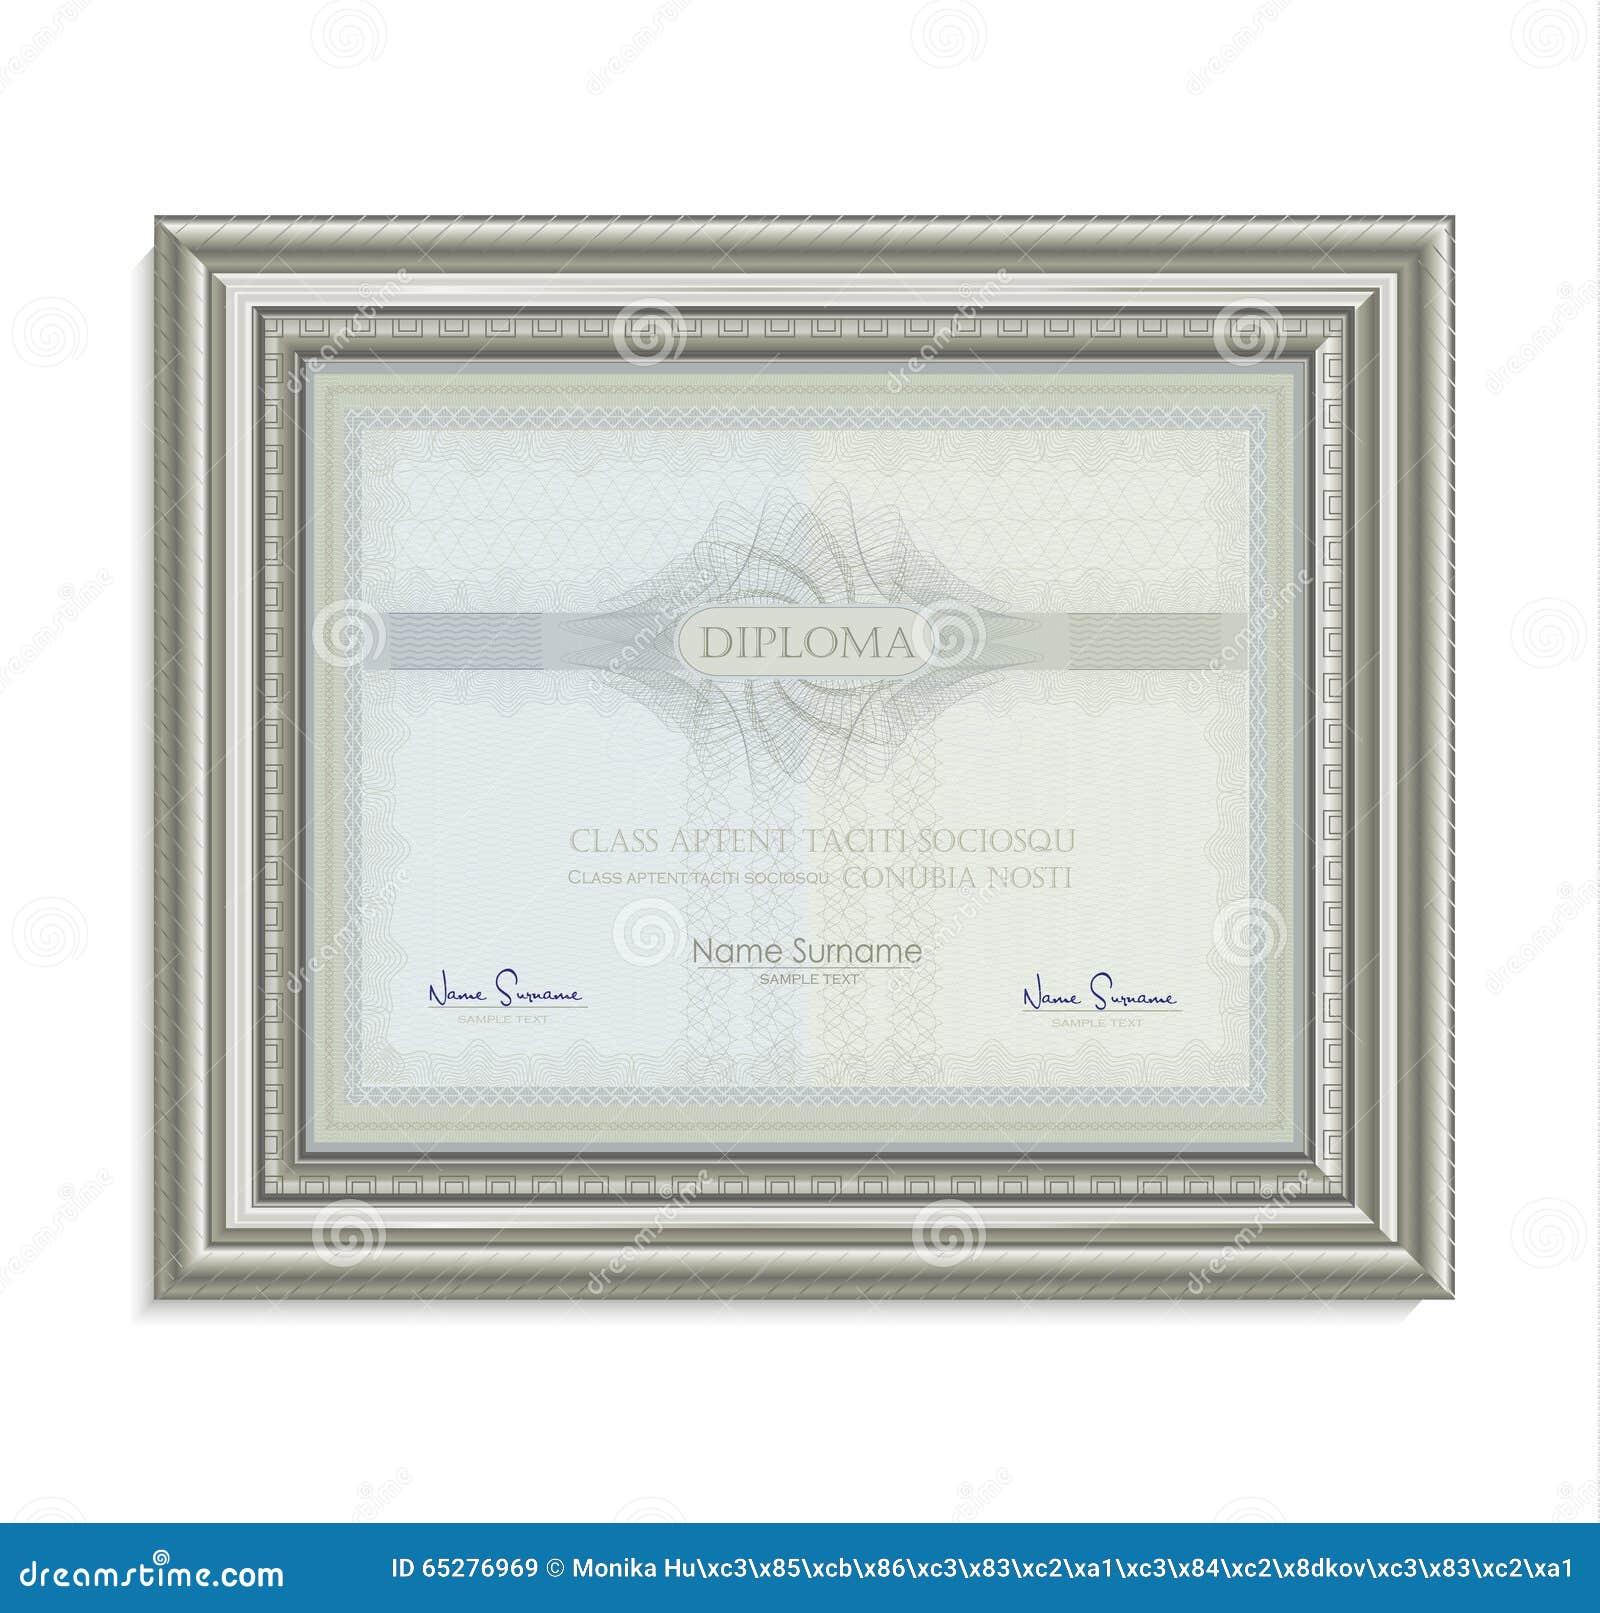 diploma certificate frame image card paper 3d natural horizontal